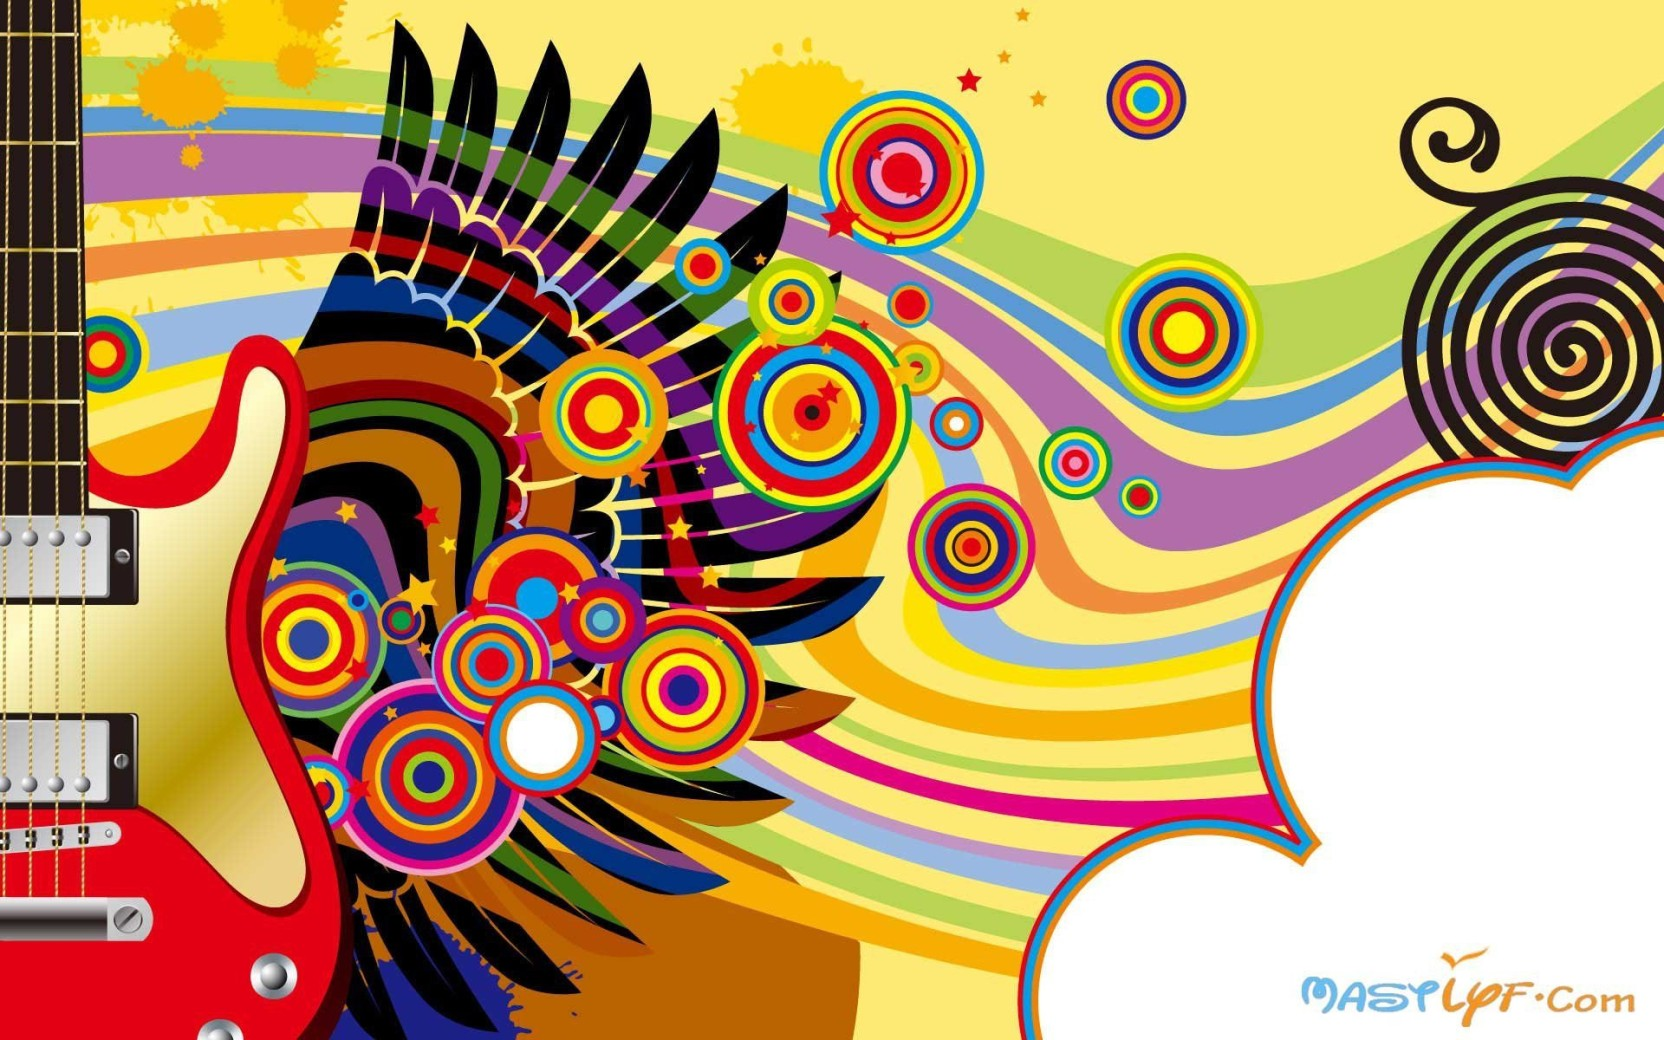 AnanyaDesignsmusics-mastlyf-iz- Wall Poster Paper Print - Music ...